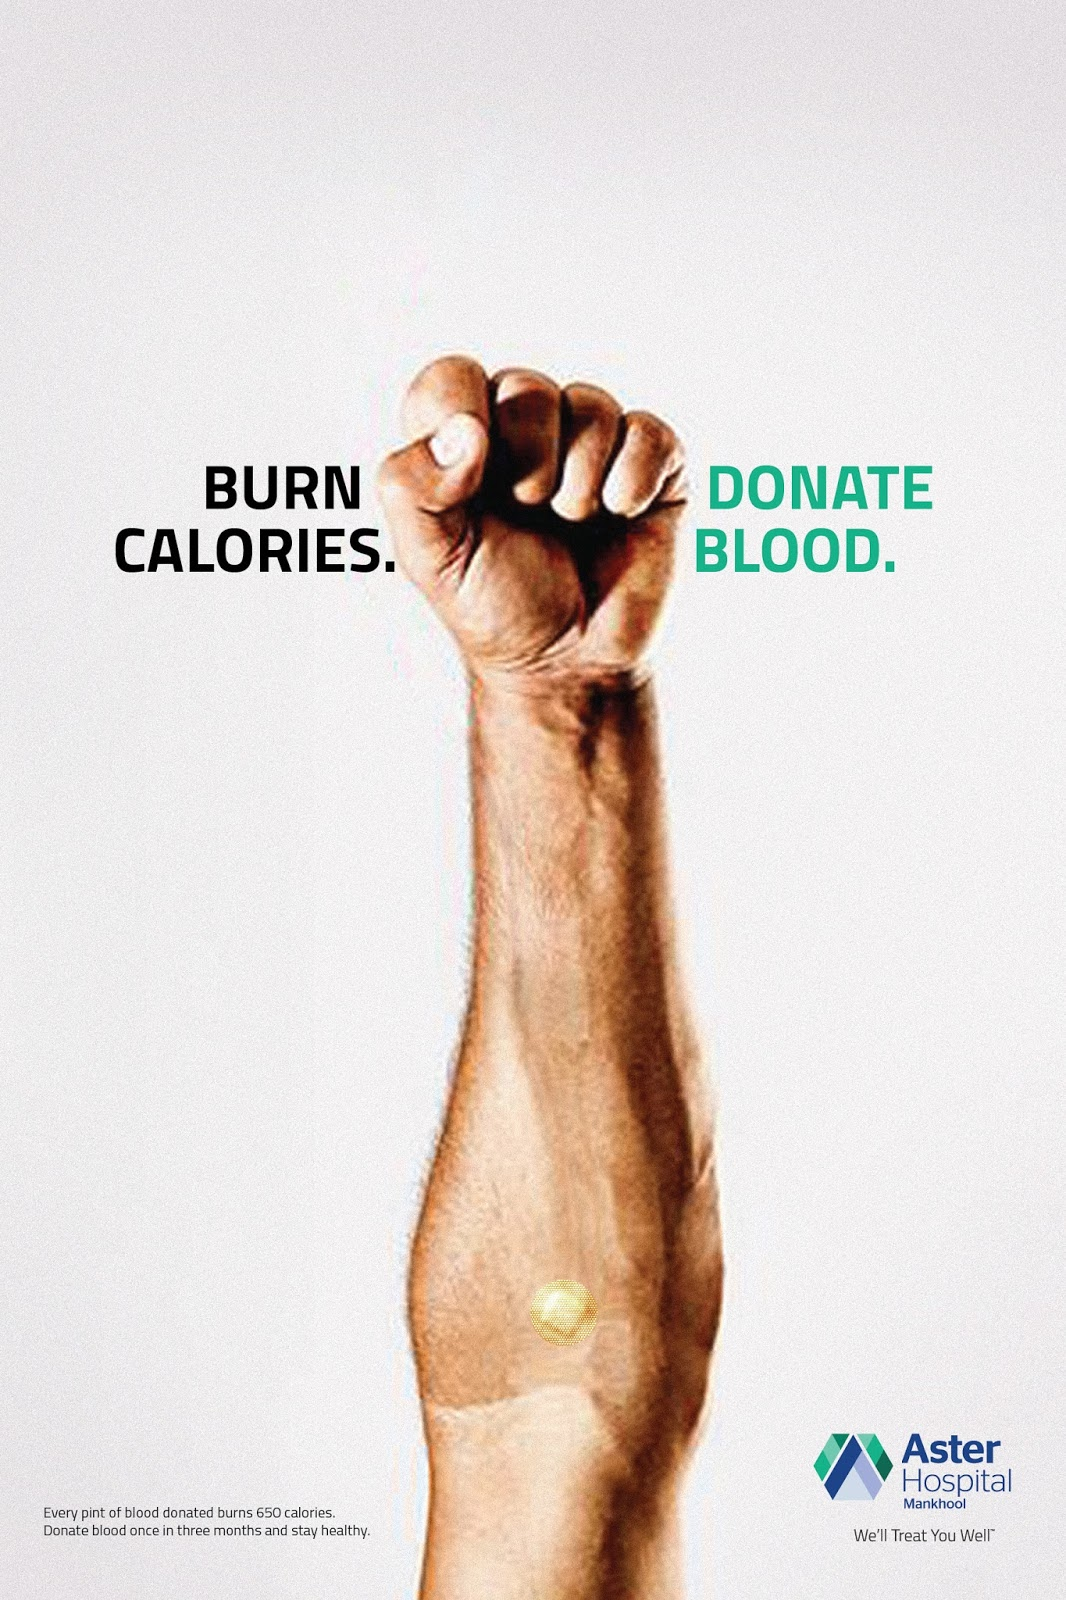 Donate Blood - Aster Hospital Mankhool | Stark Communications Pvt Ltd